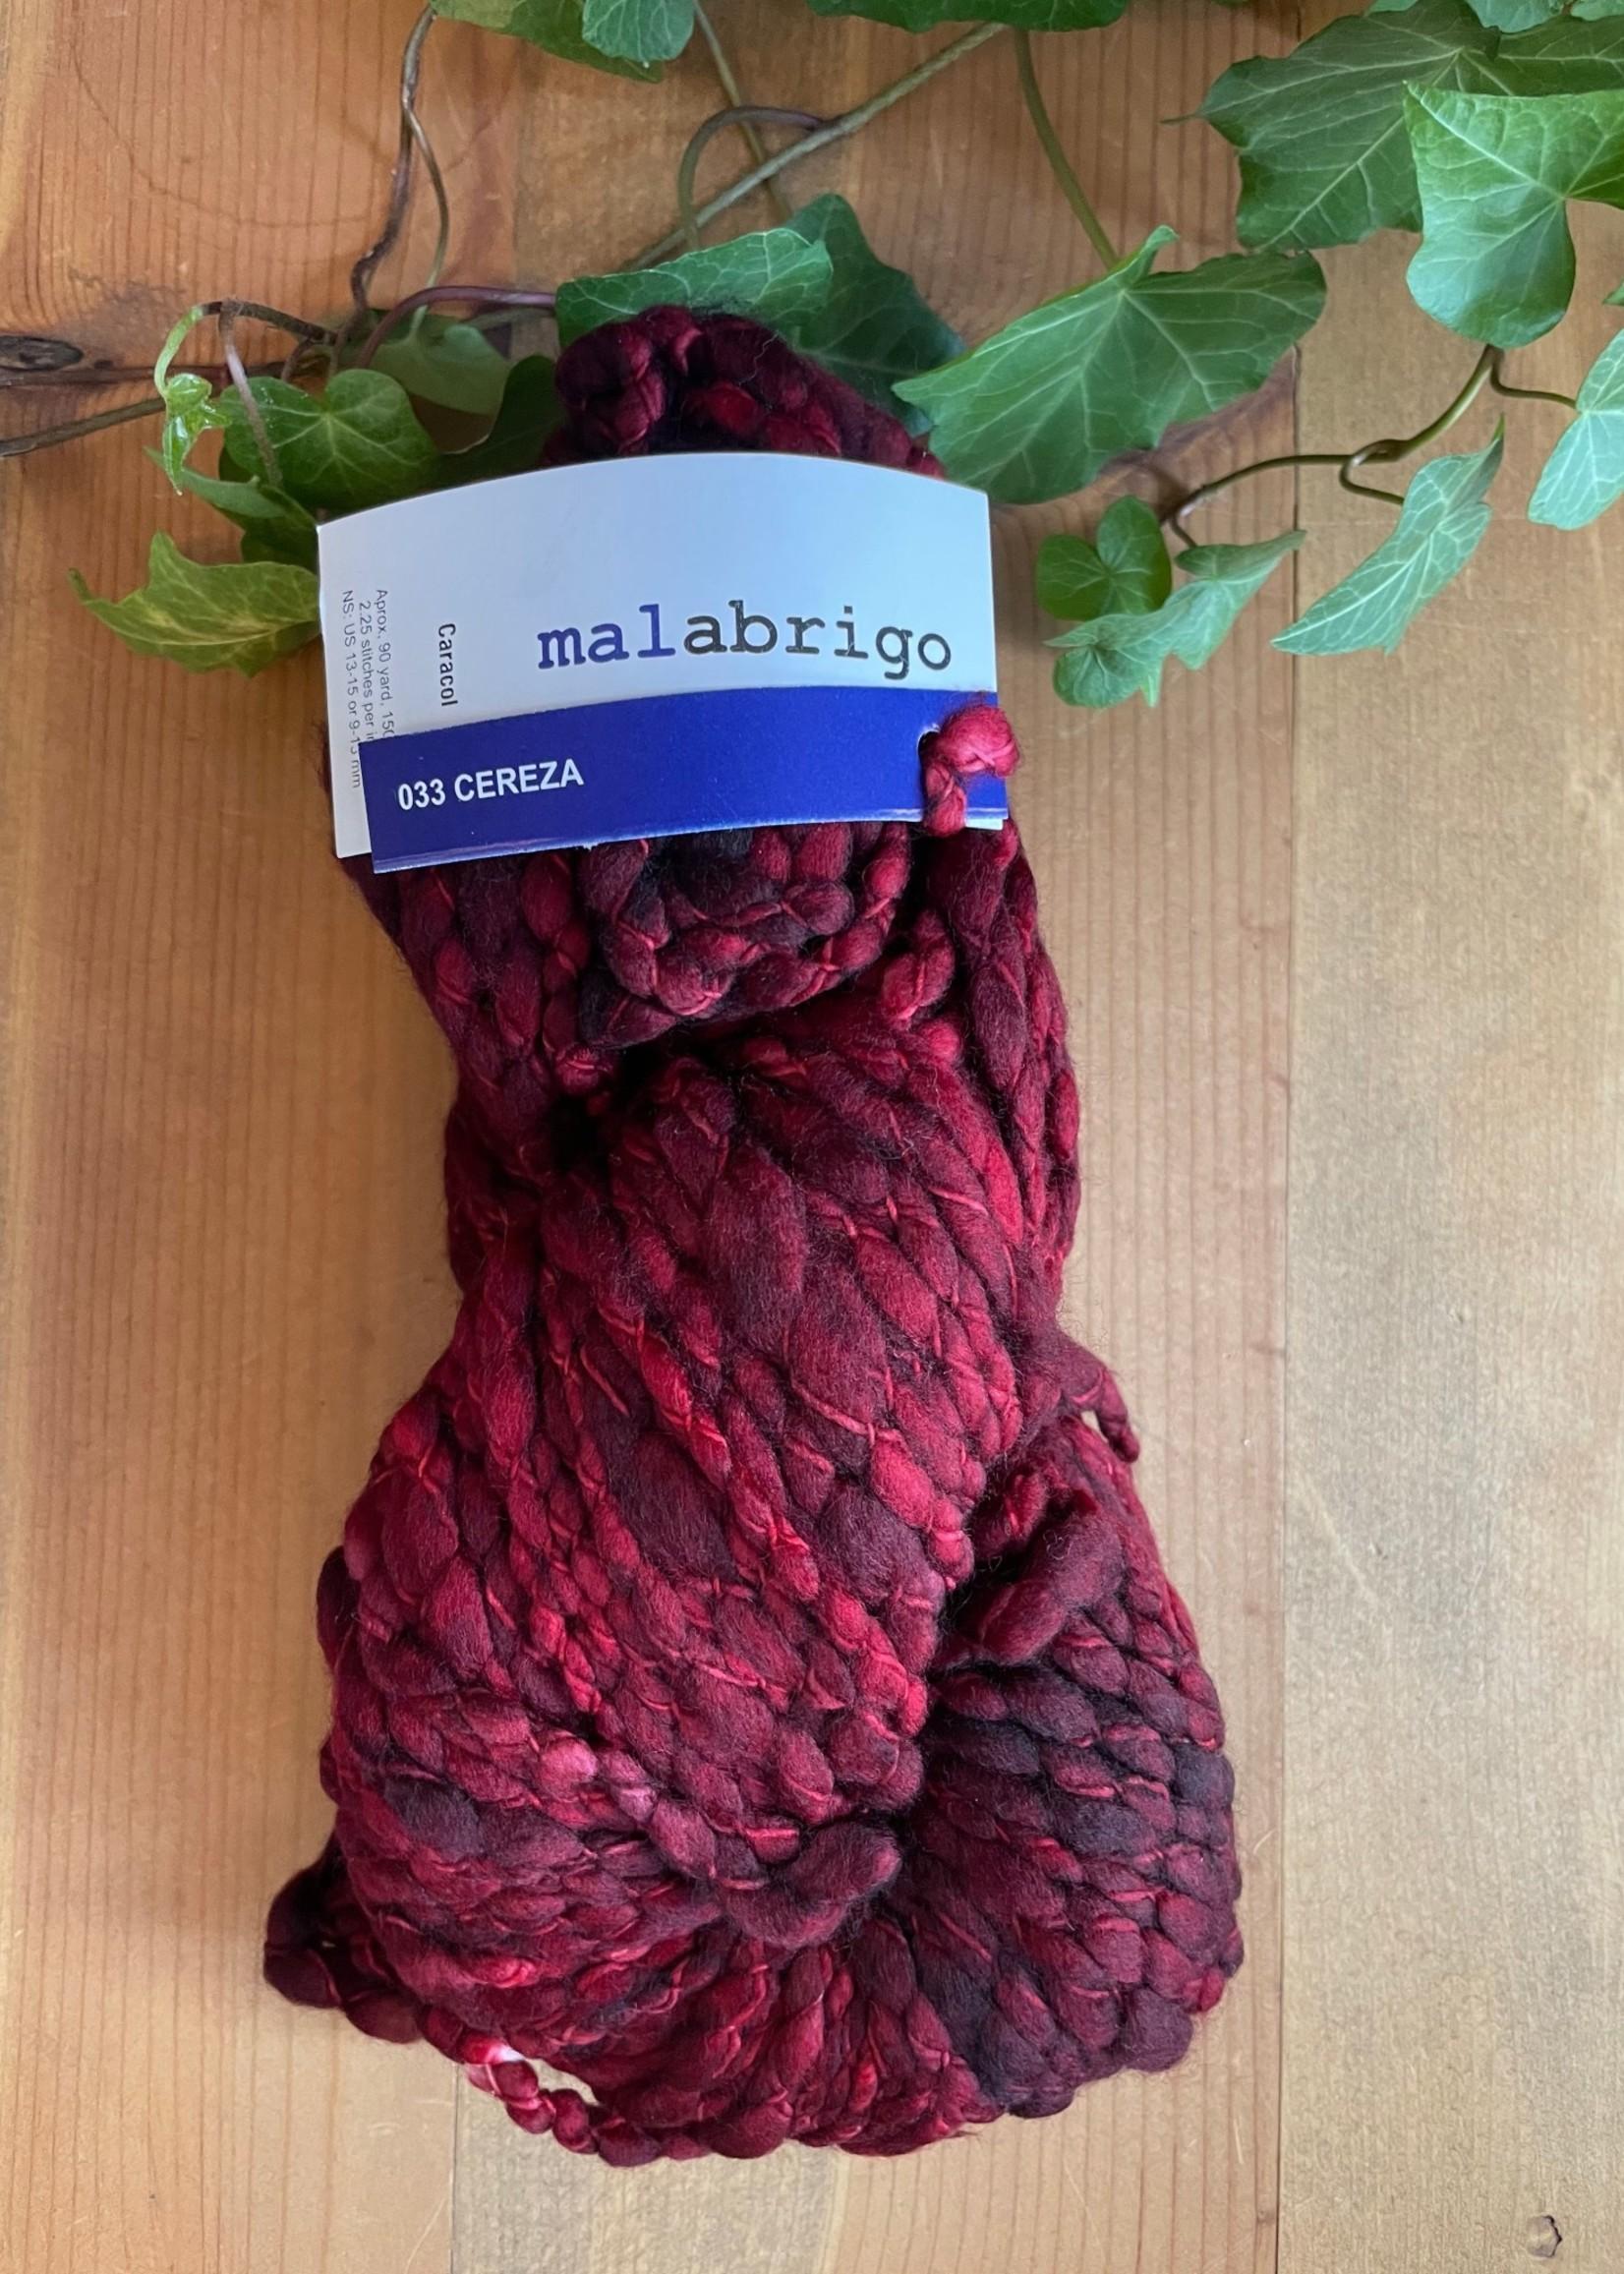 Malabrigo Caracol Yarn